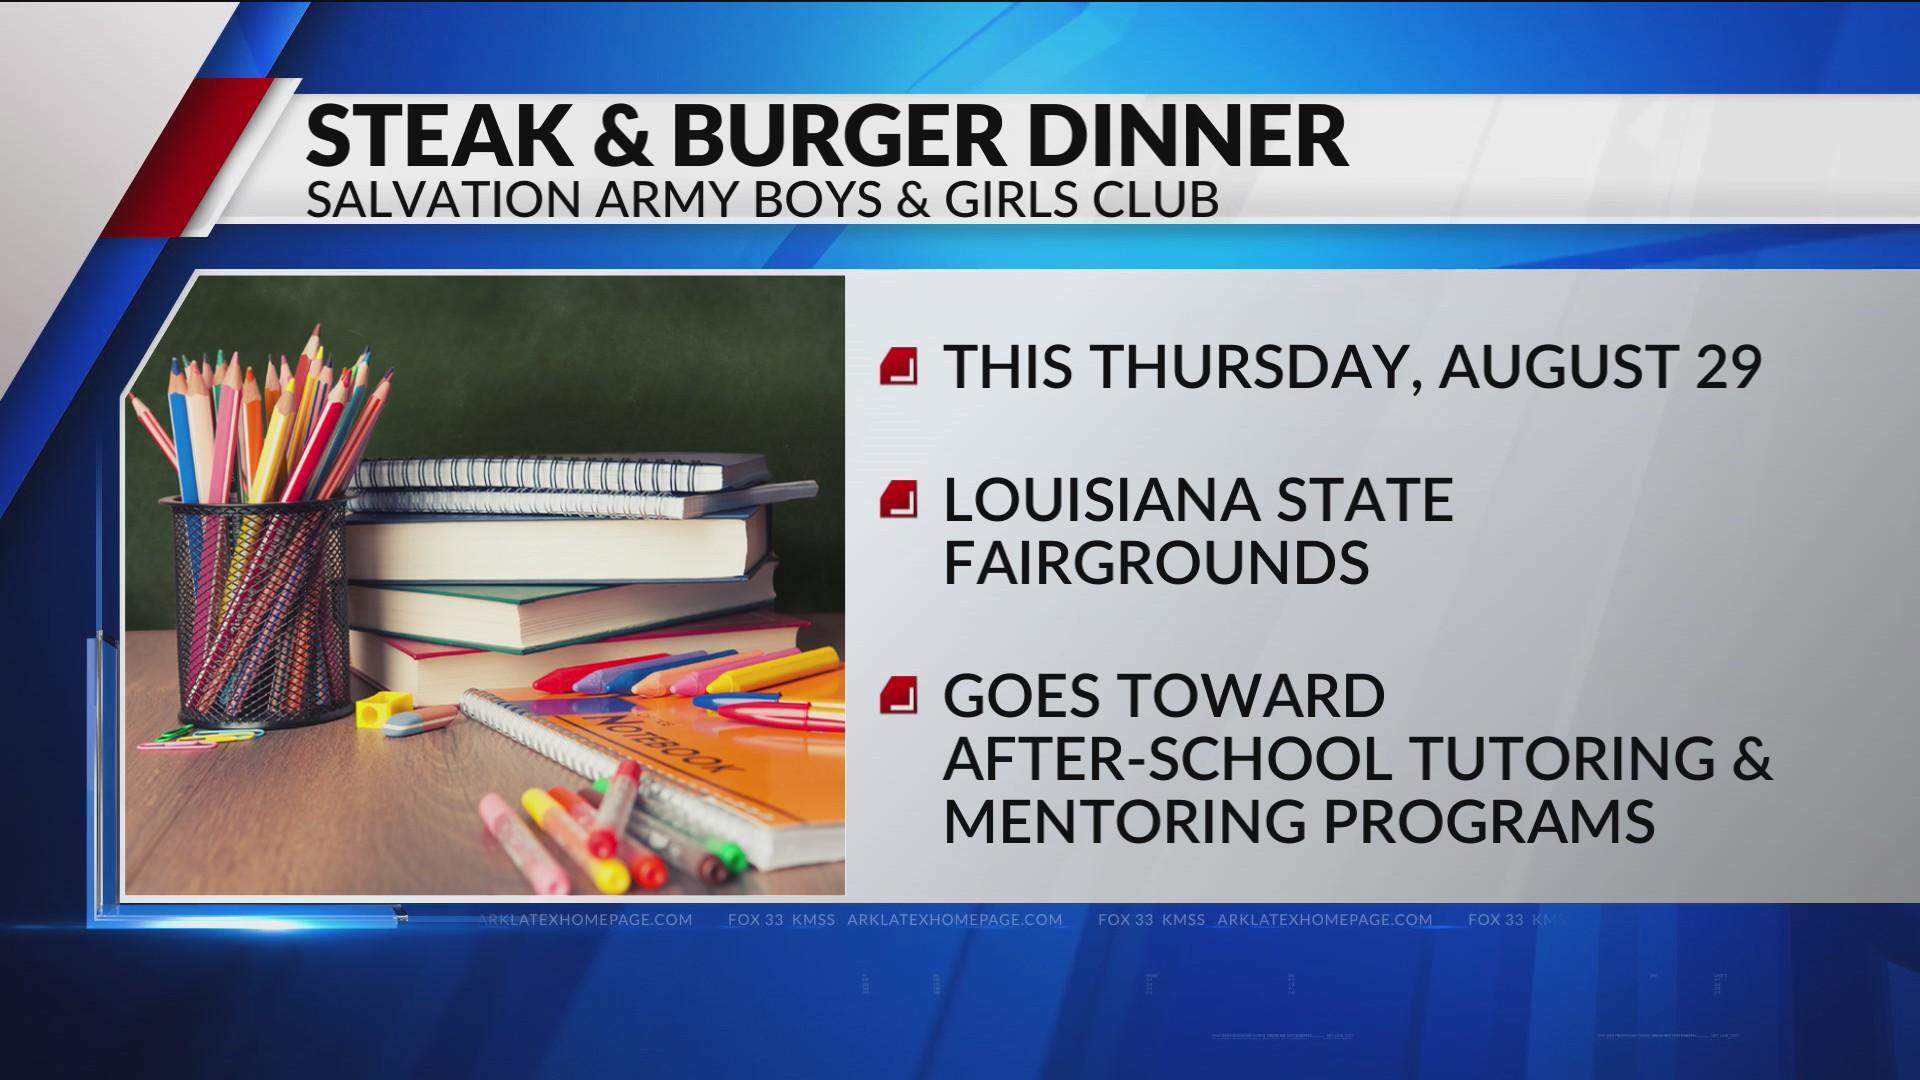 2019 Steak and Burger Dinner raises money for local students